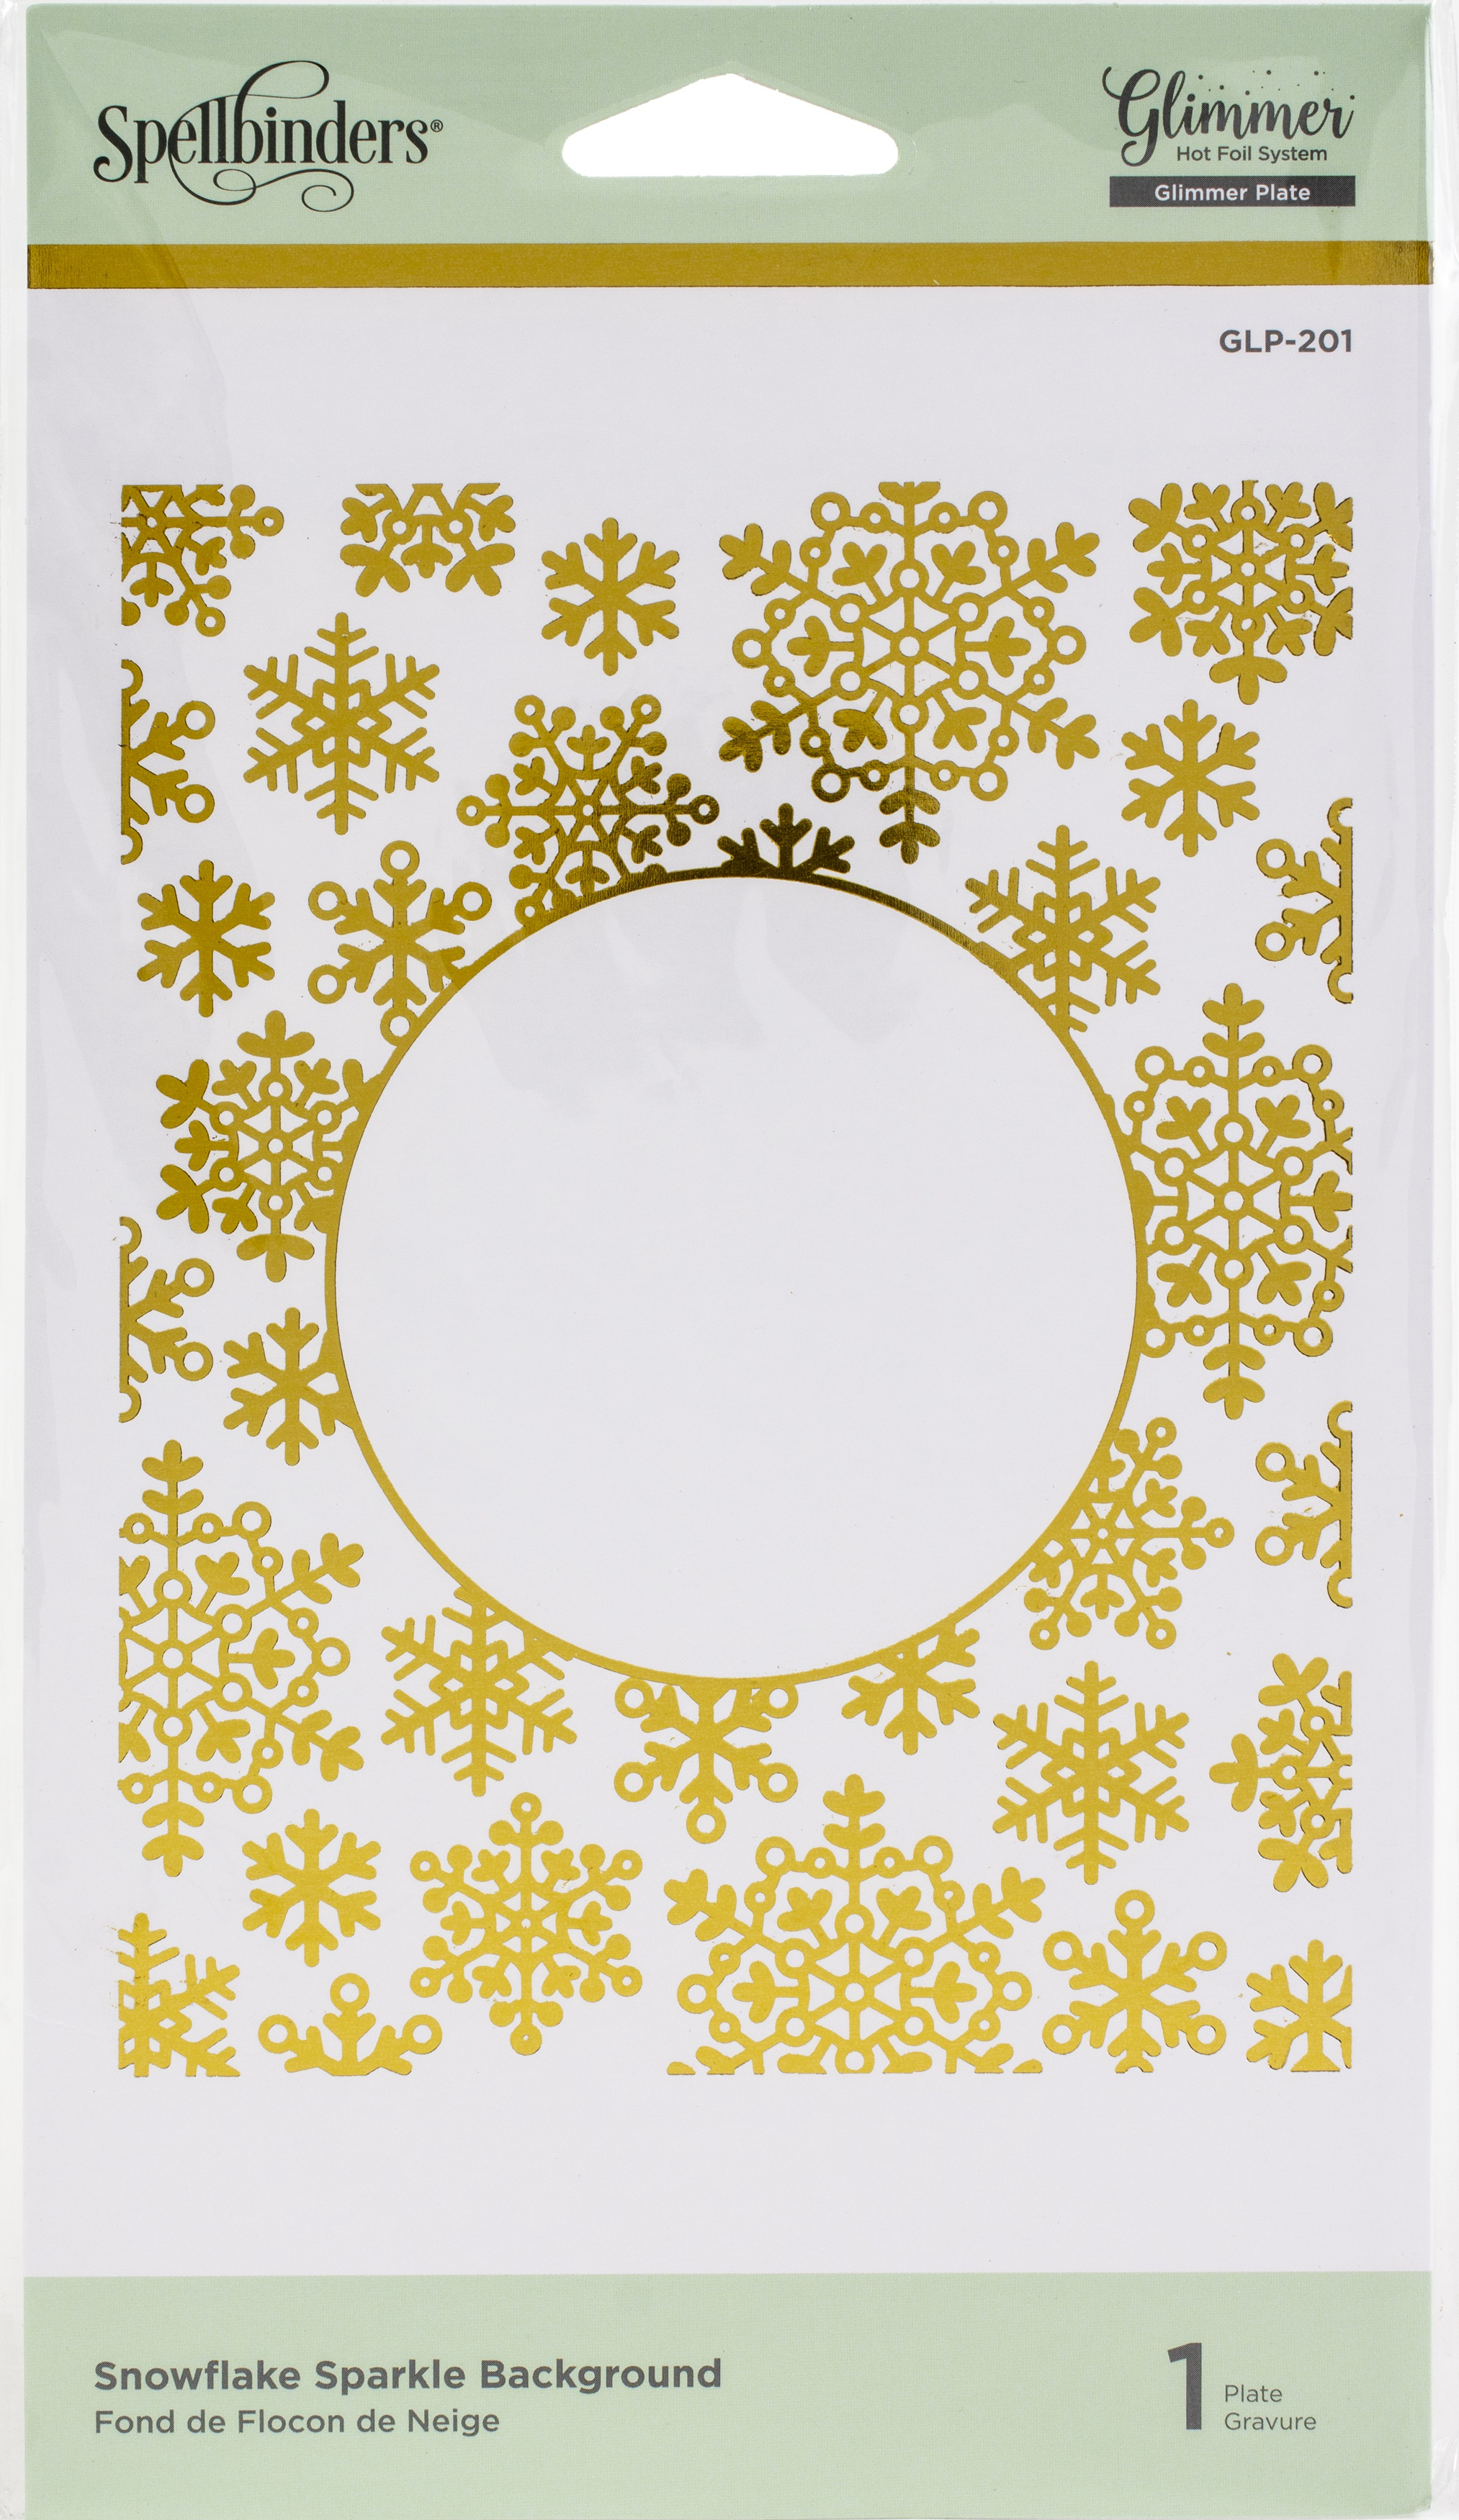 Spellbinders Glimmer Backgrounds Hot Foil Plate-Snowflake Sparkle